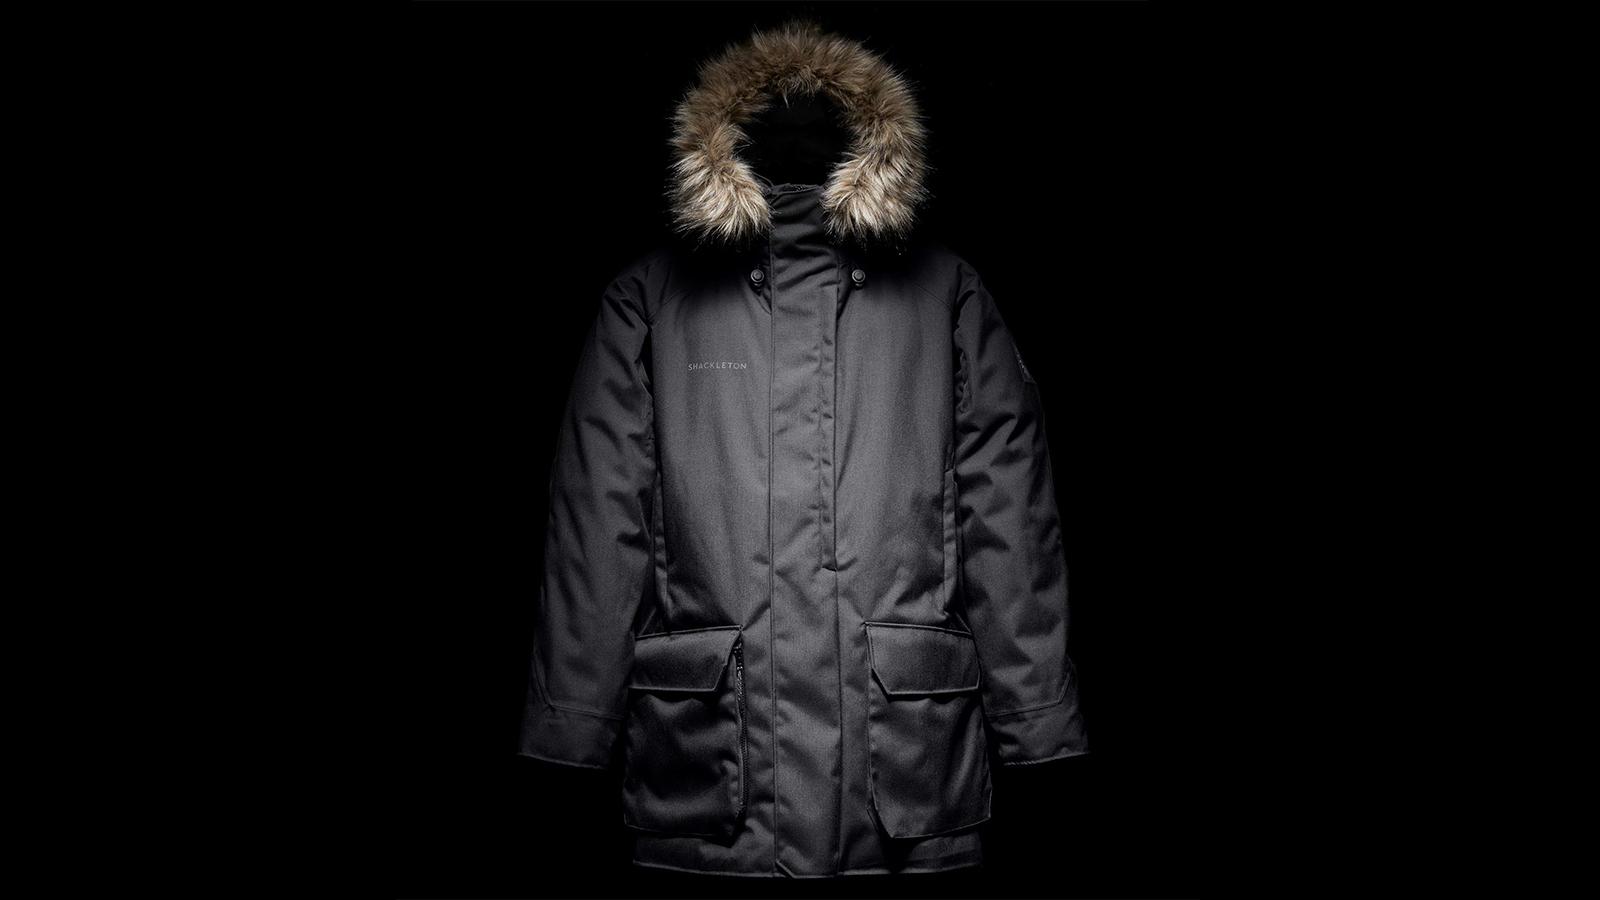 Shackleton x Leica Frank Hurley Photographer´s Jacket